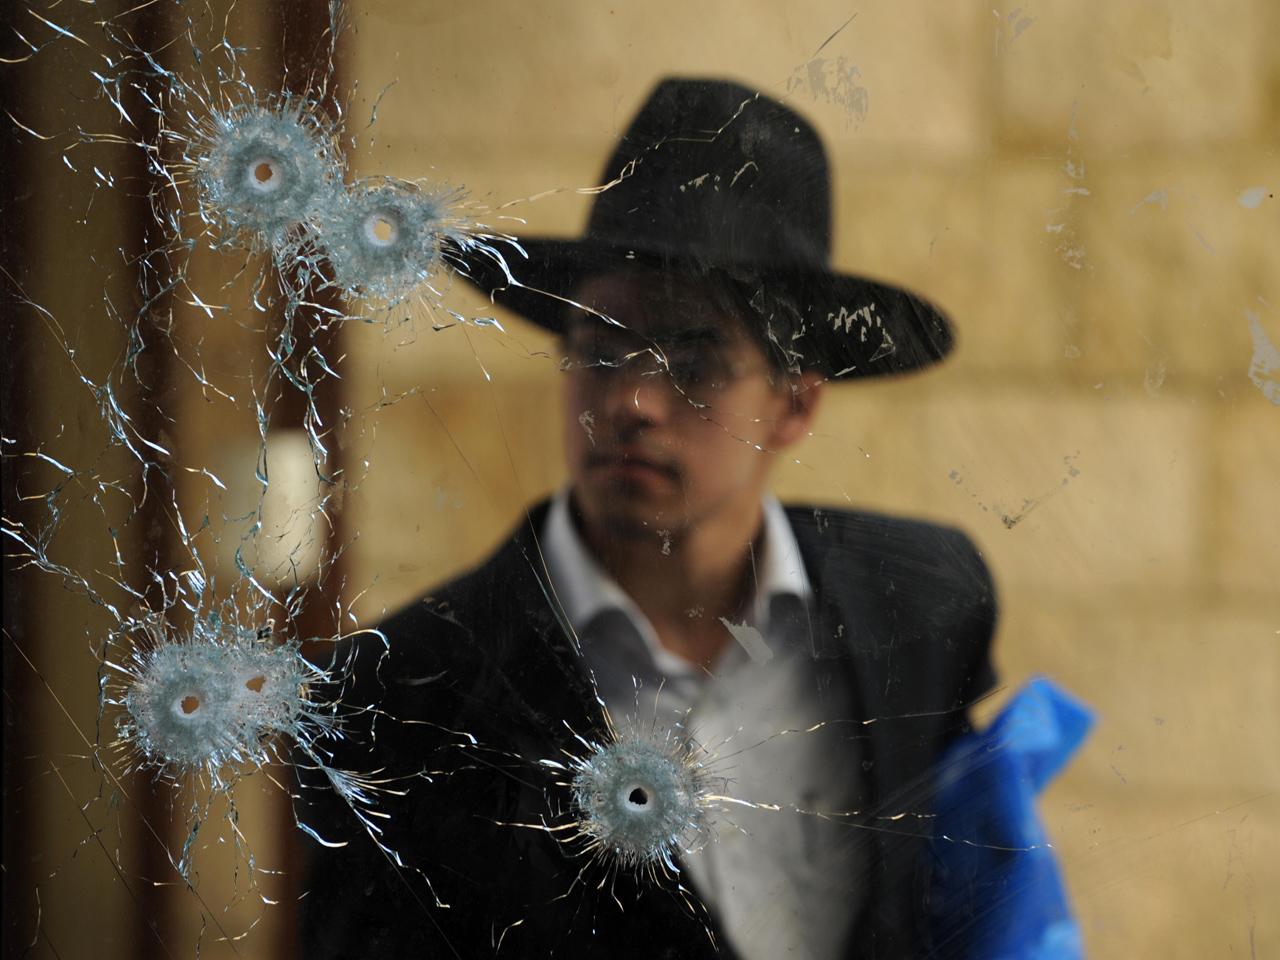 Israel rejects NRA's guns-in-schools claim - CBS News